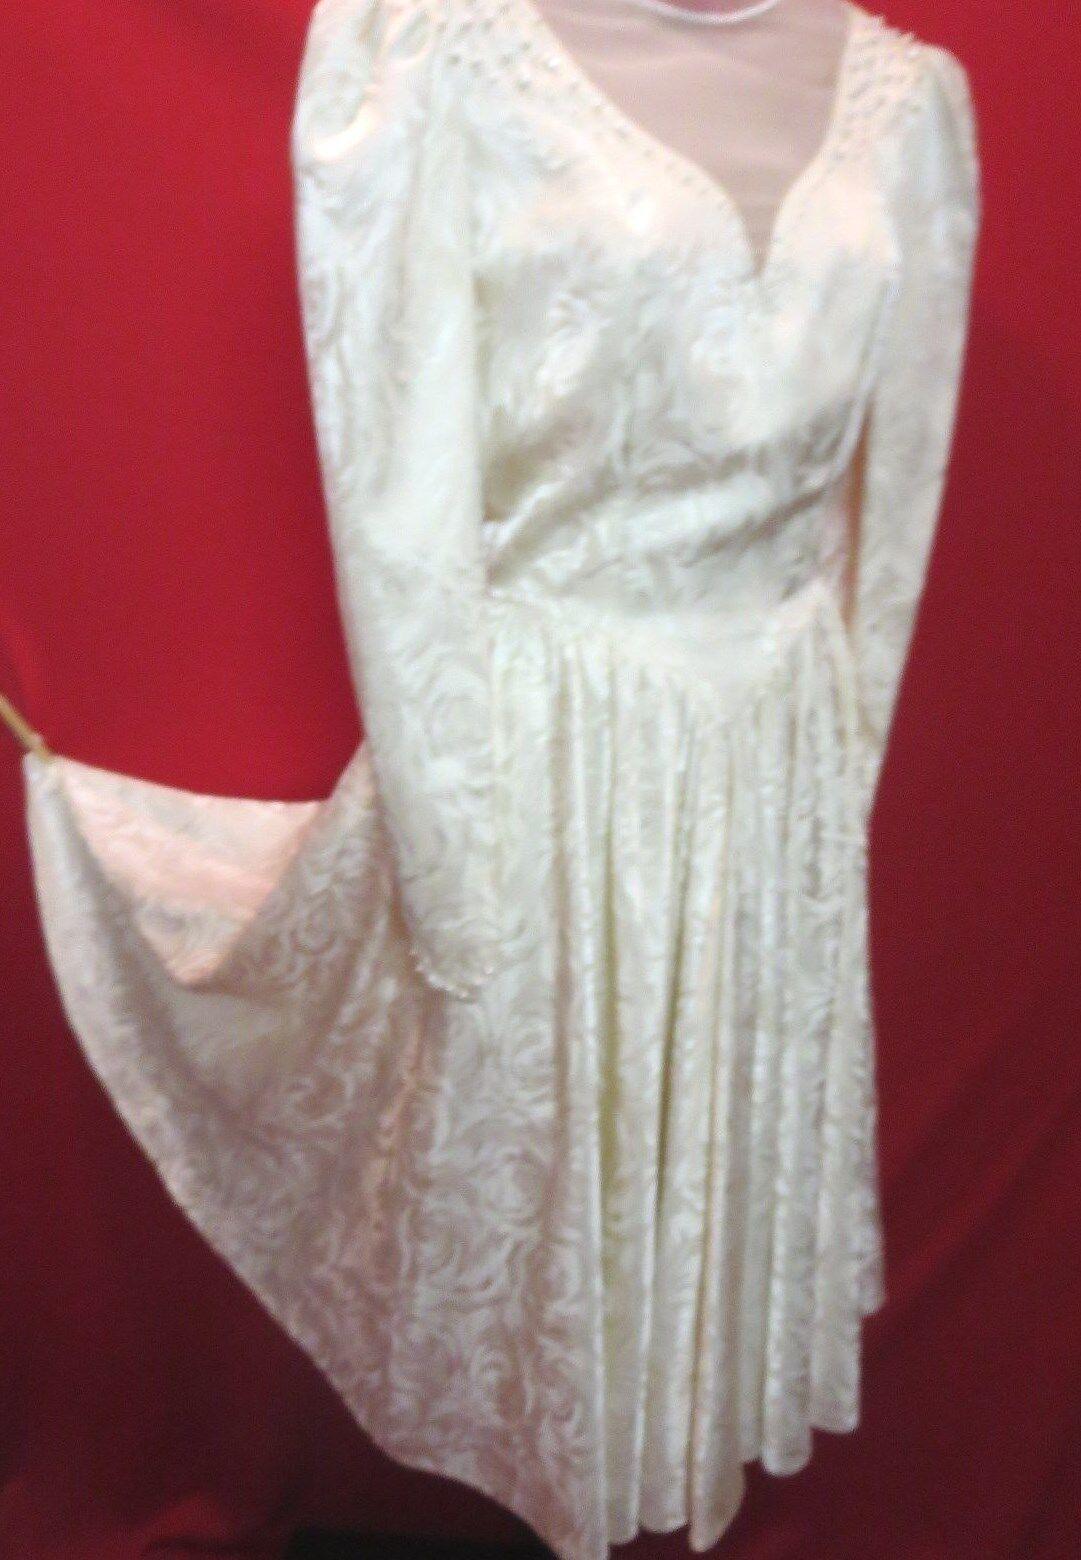 NYGAARD Stunning Vtg Rare 70's Satin pinks Ivory Pearl Beads Wedding Dress S